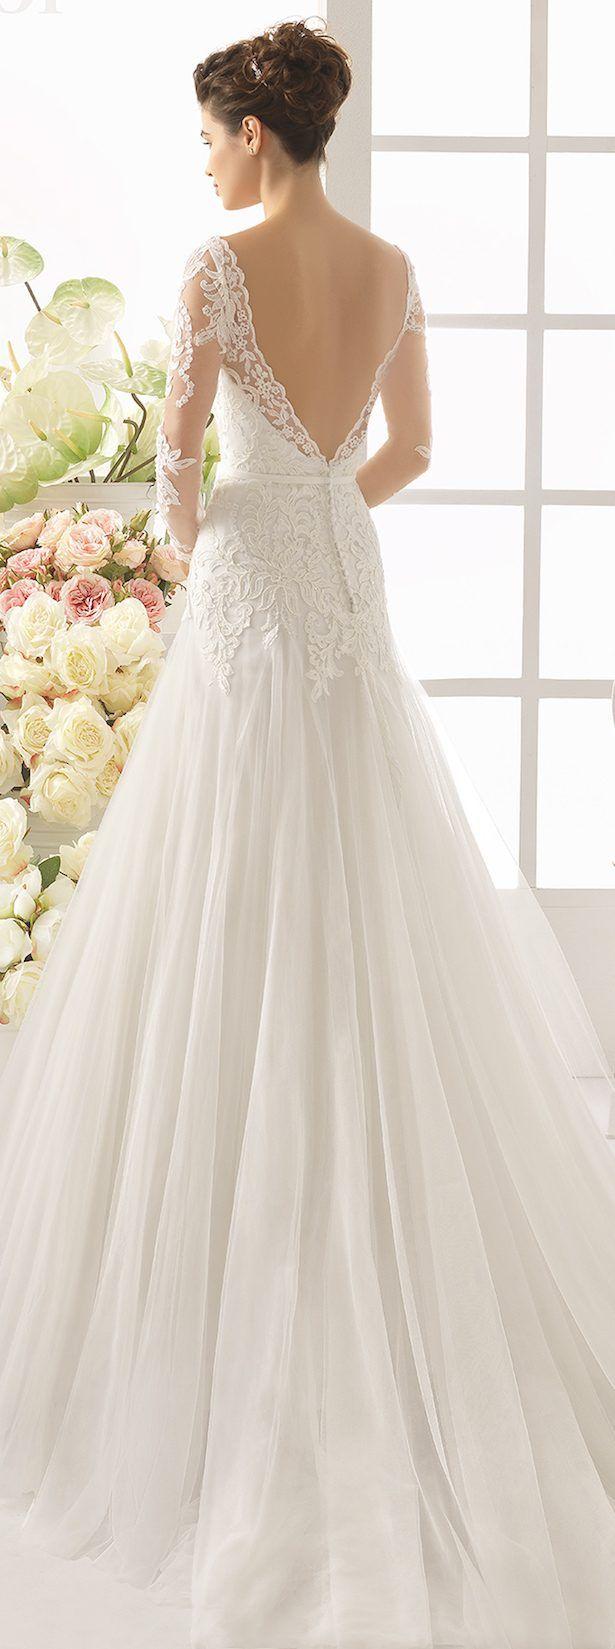 Wedding-Dresses-0859